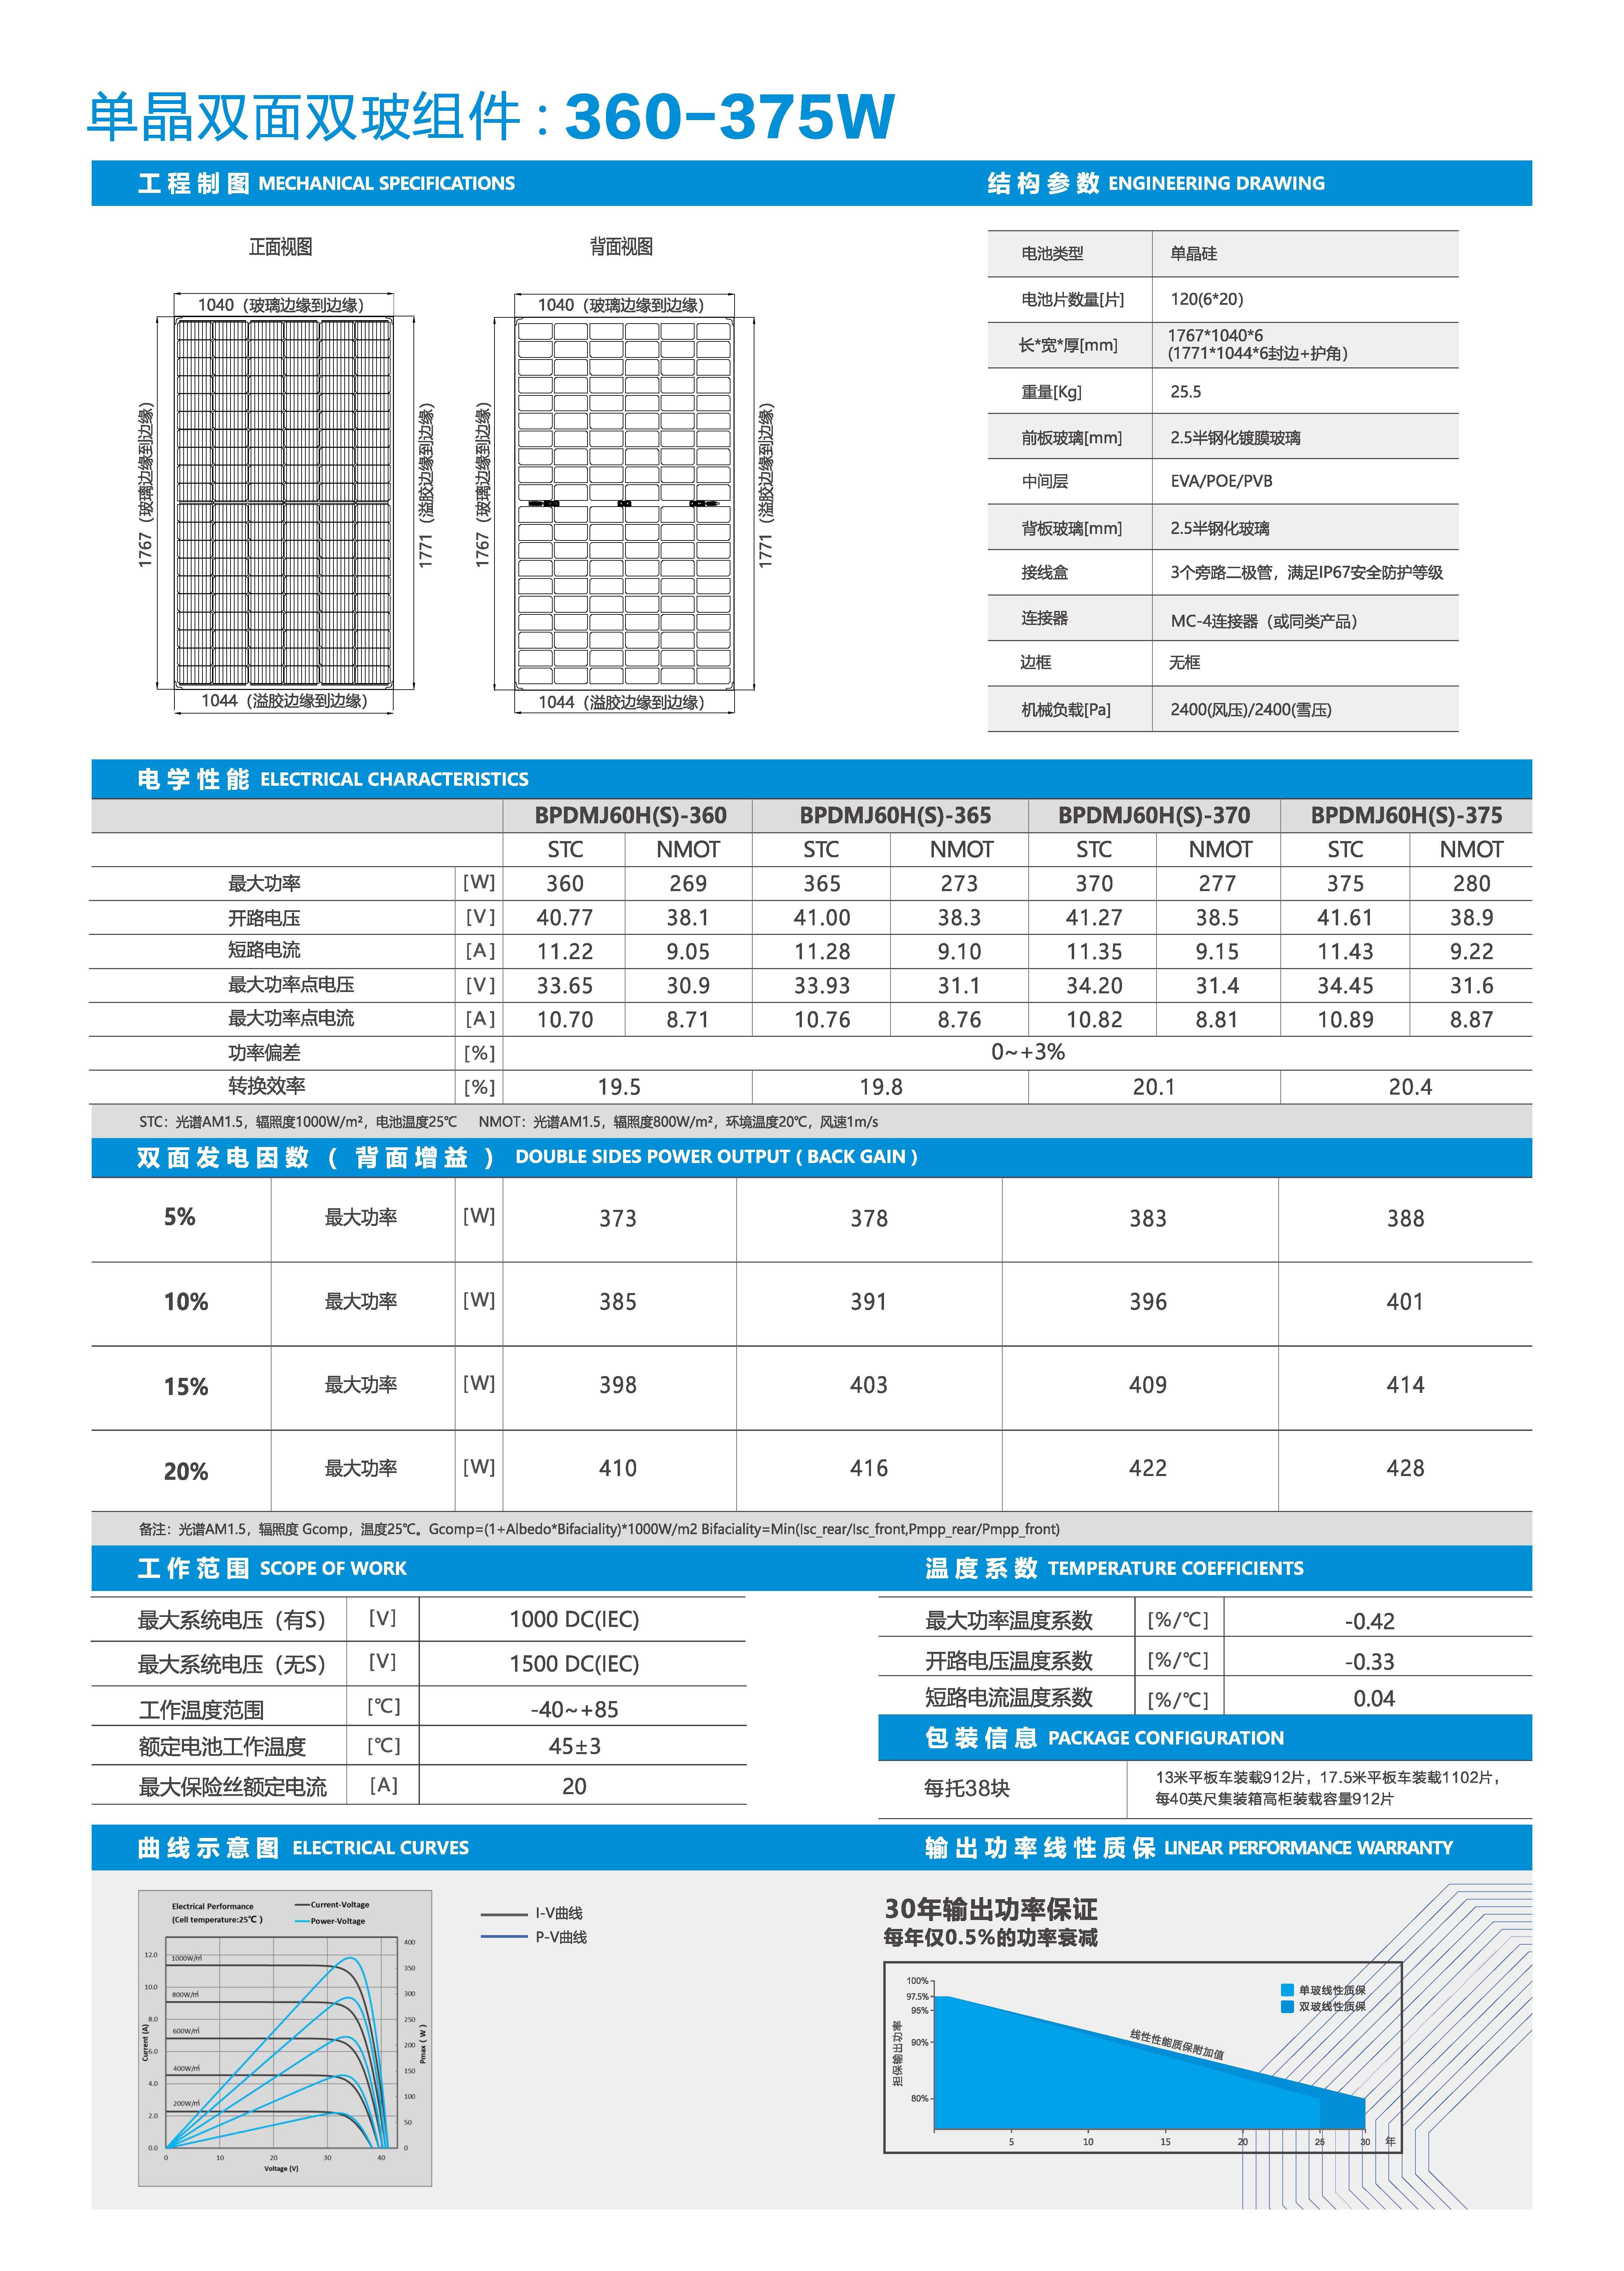 BPDMJ60H(S)-360-375